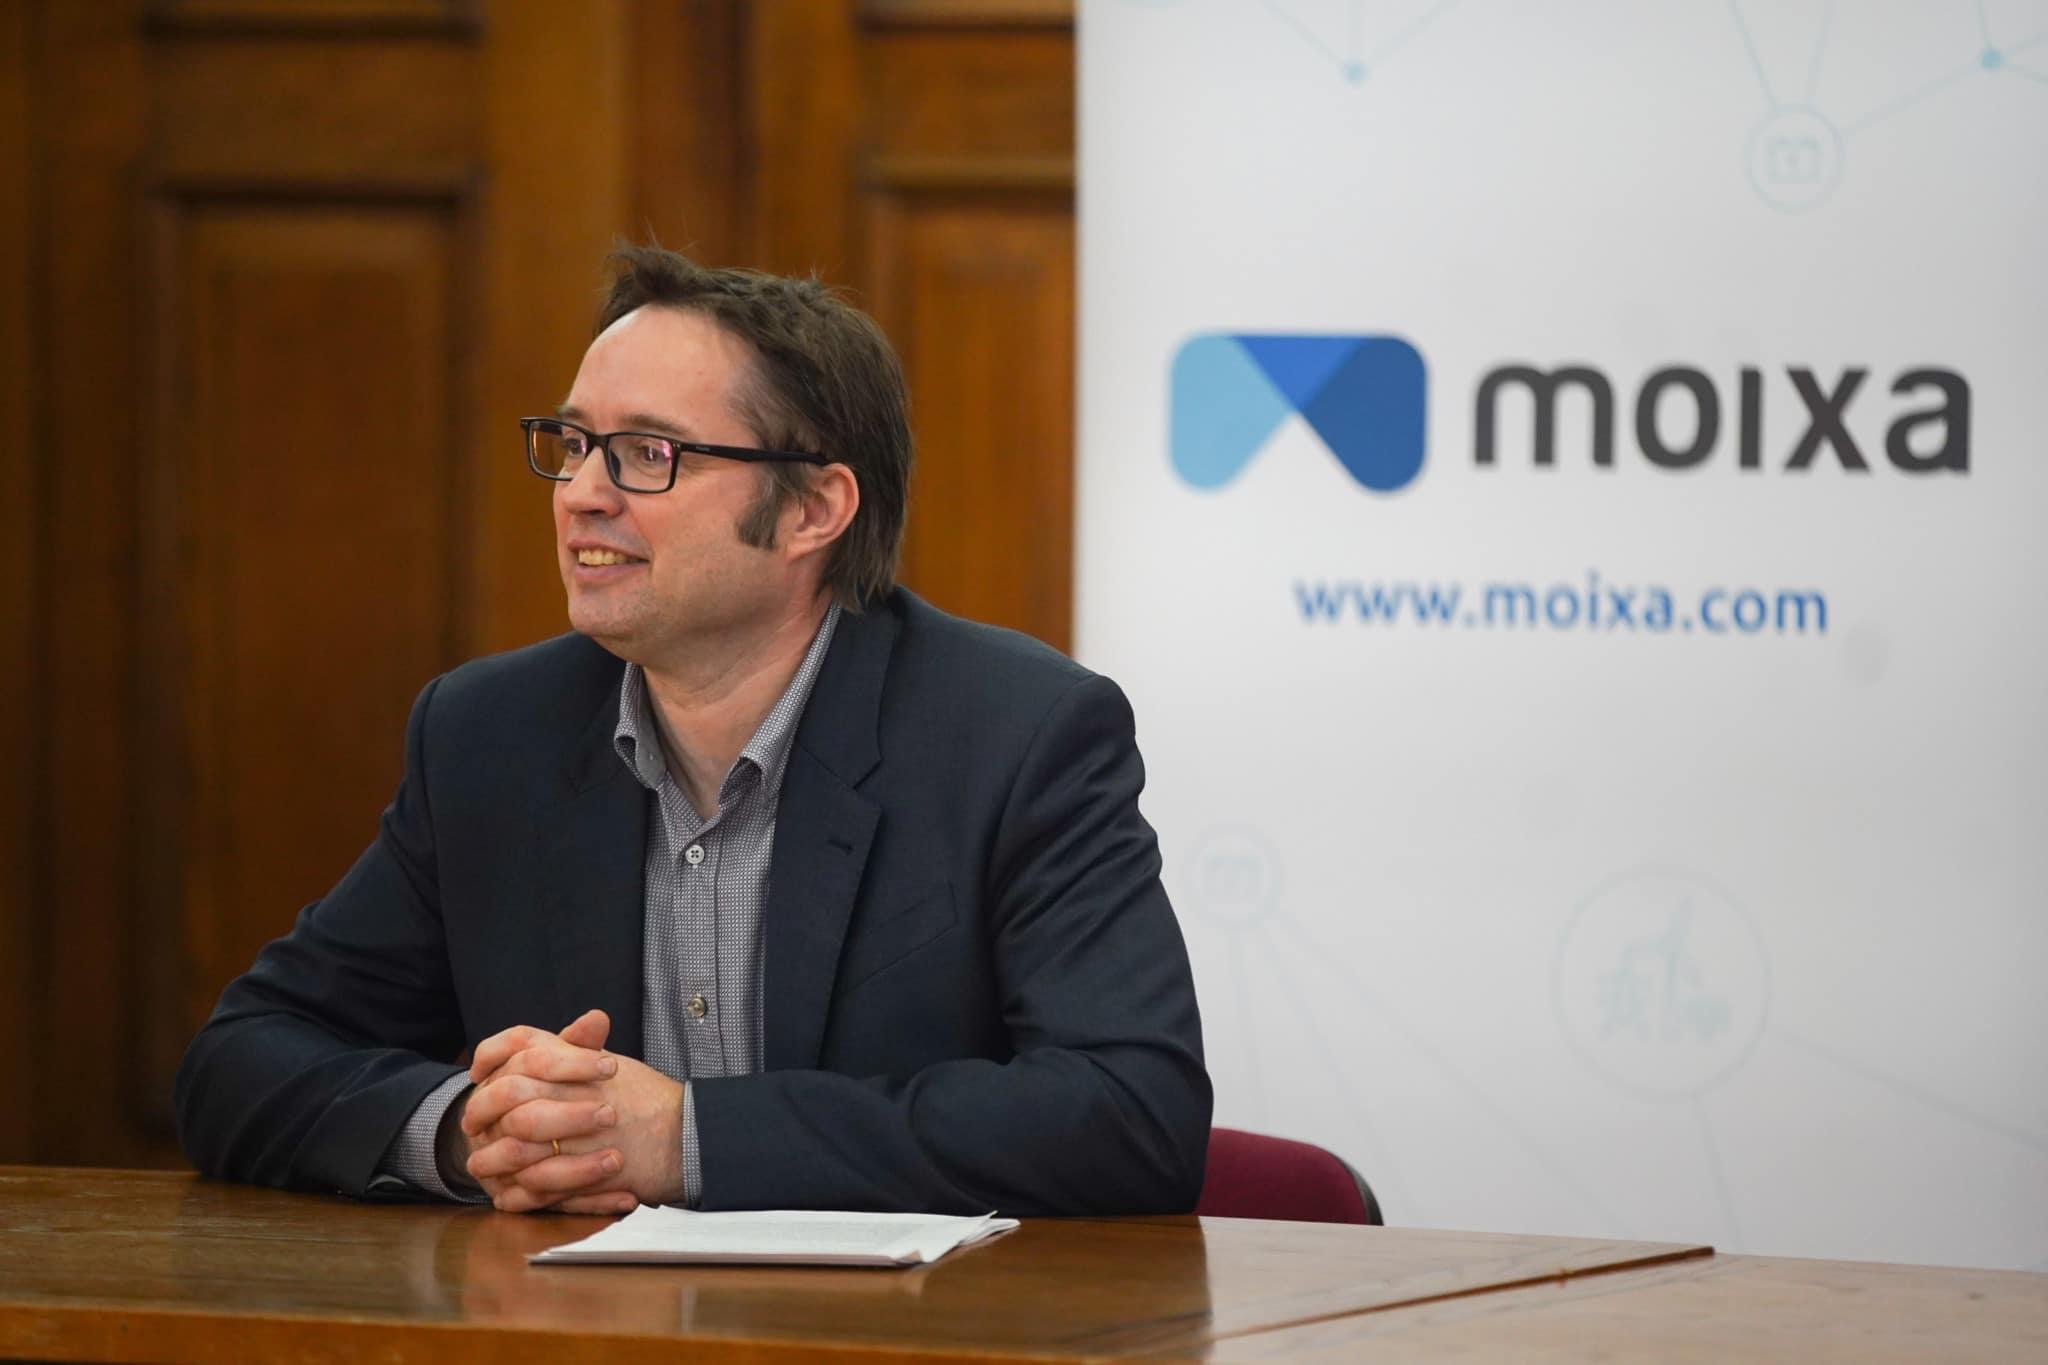 Moixa Honda Meeting